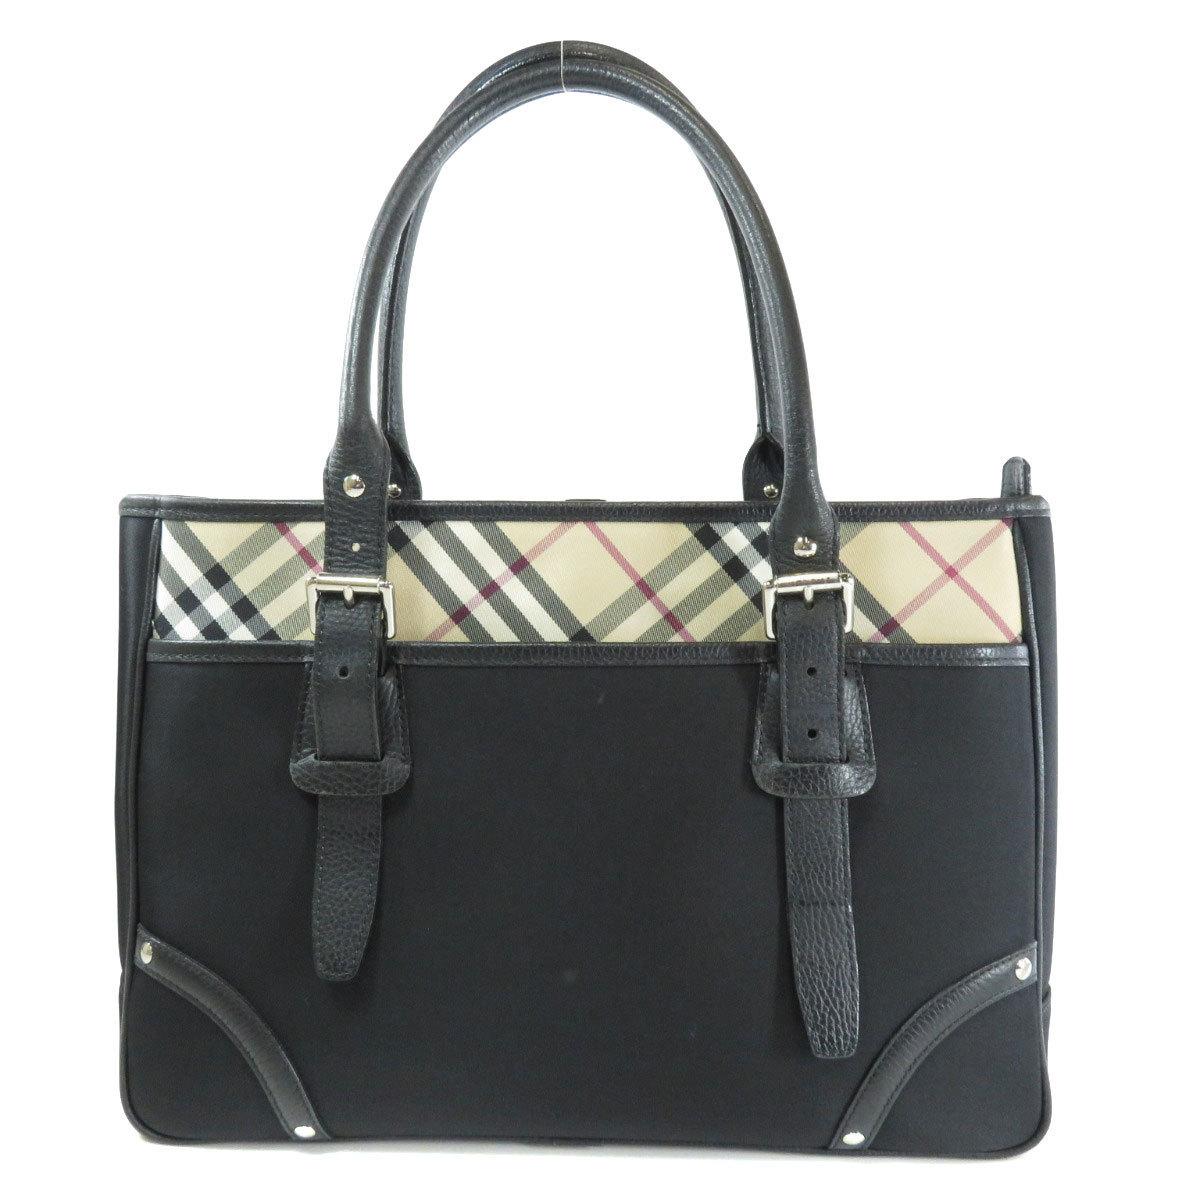 Burberry Nova Check Tote Bag Nylon Leather Ladies